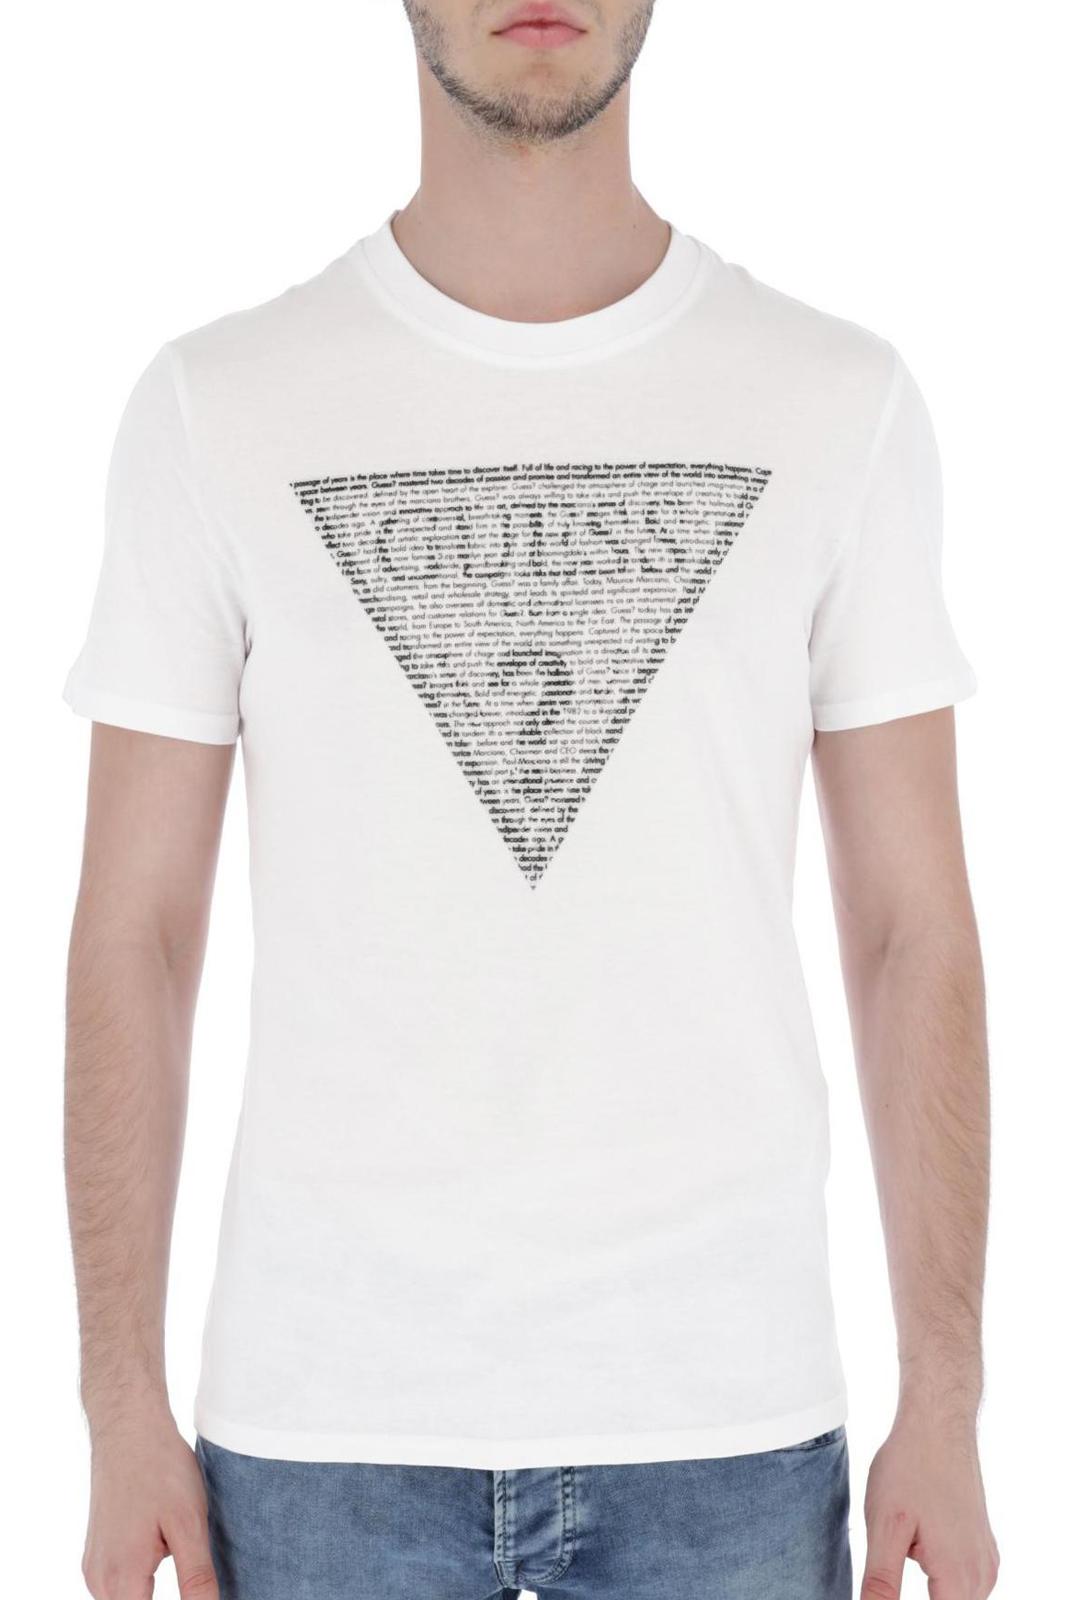 T-S manches courtes  Guess jeans M83I03 I3Z00 TWHT